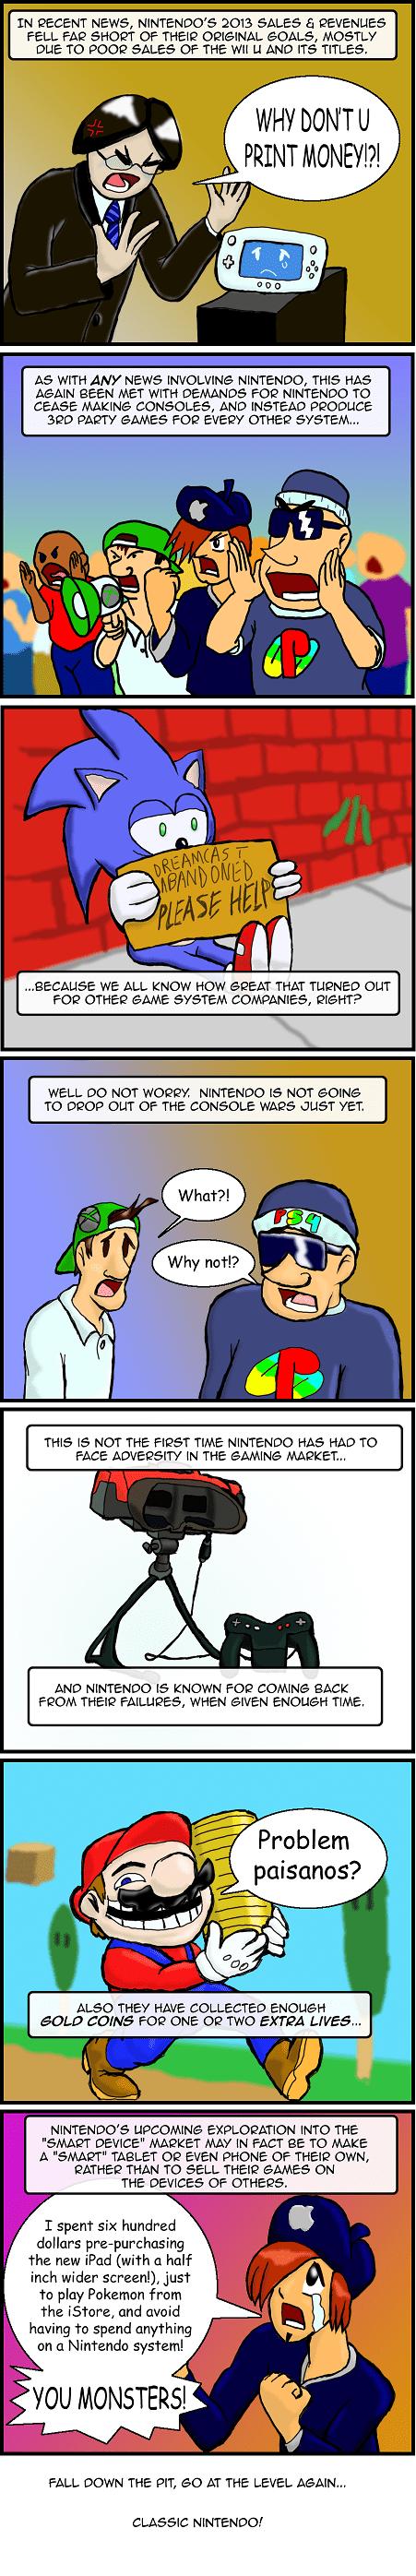 rage nintendo web comics - 8018371072